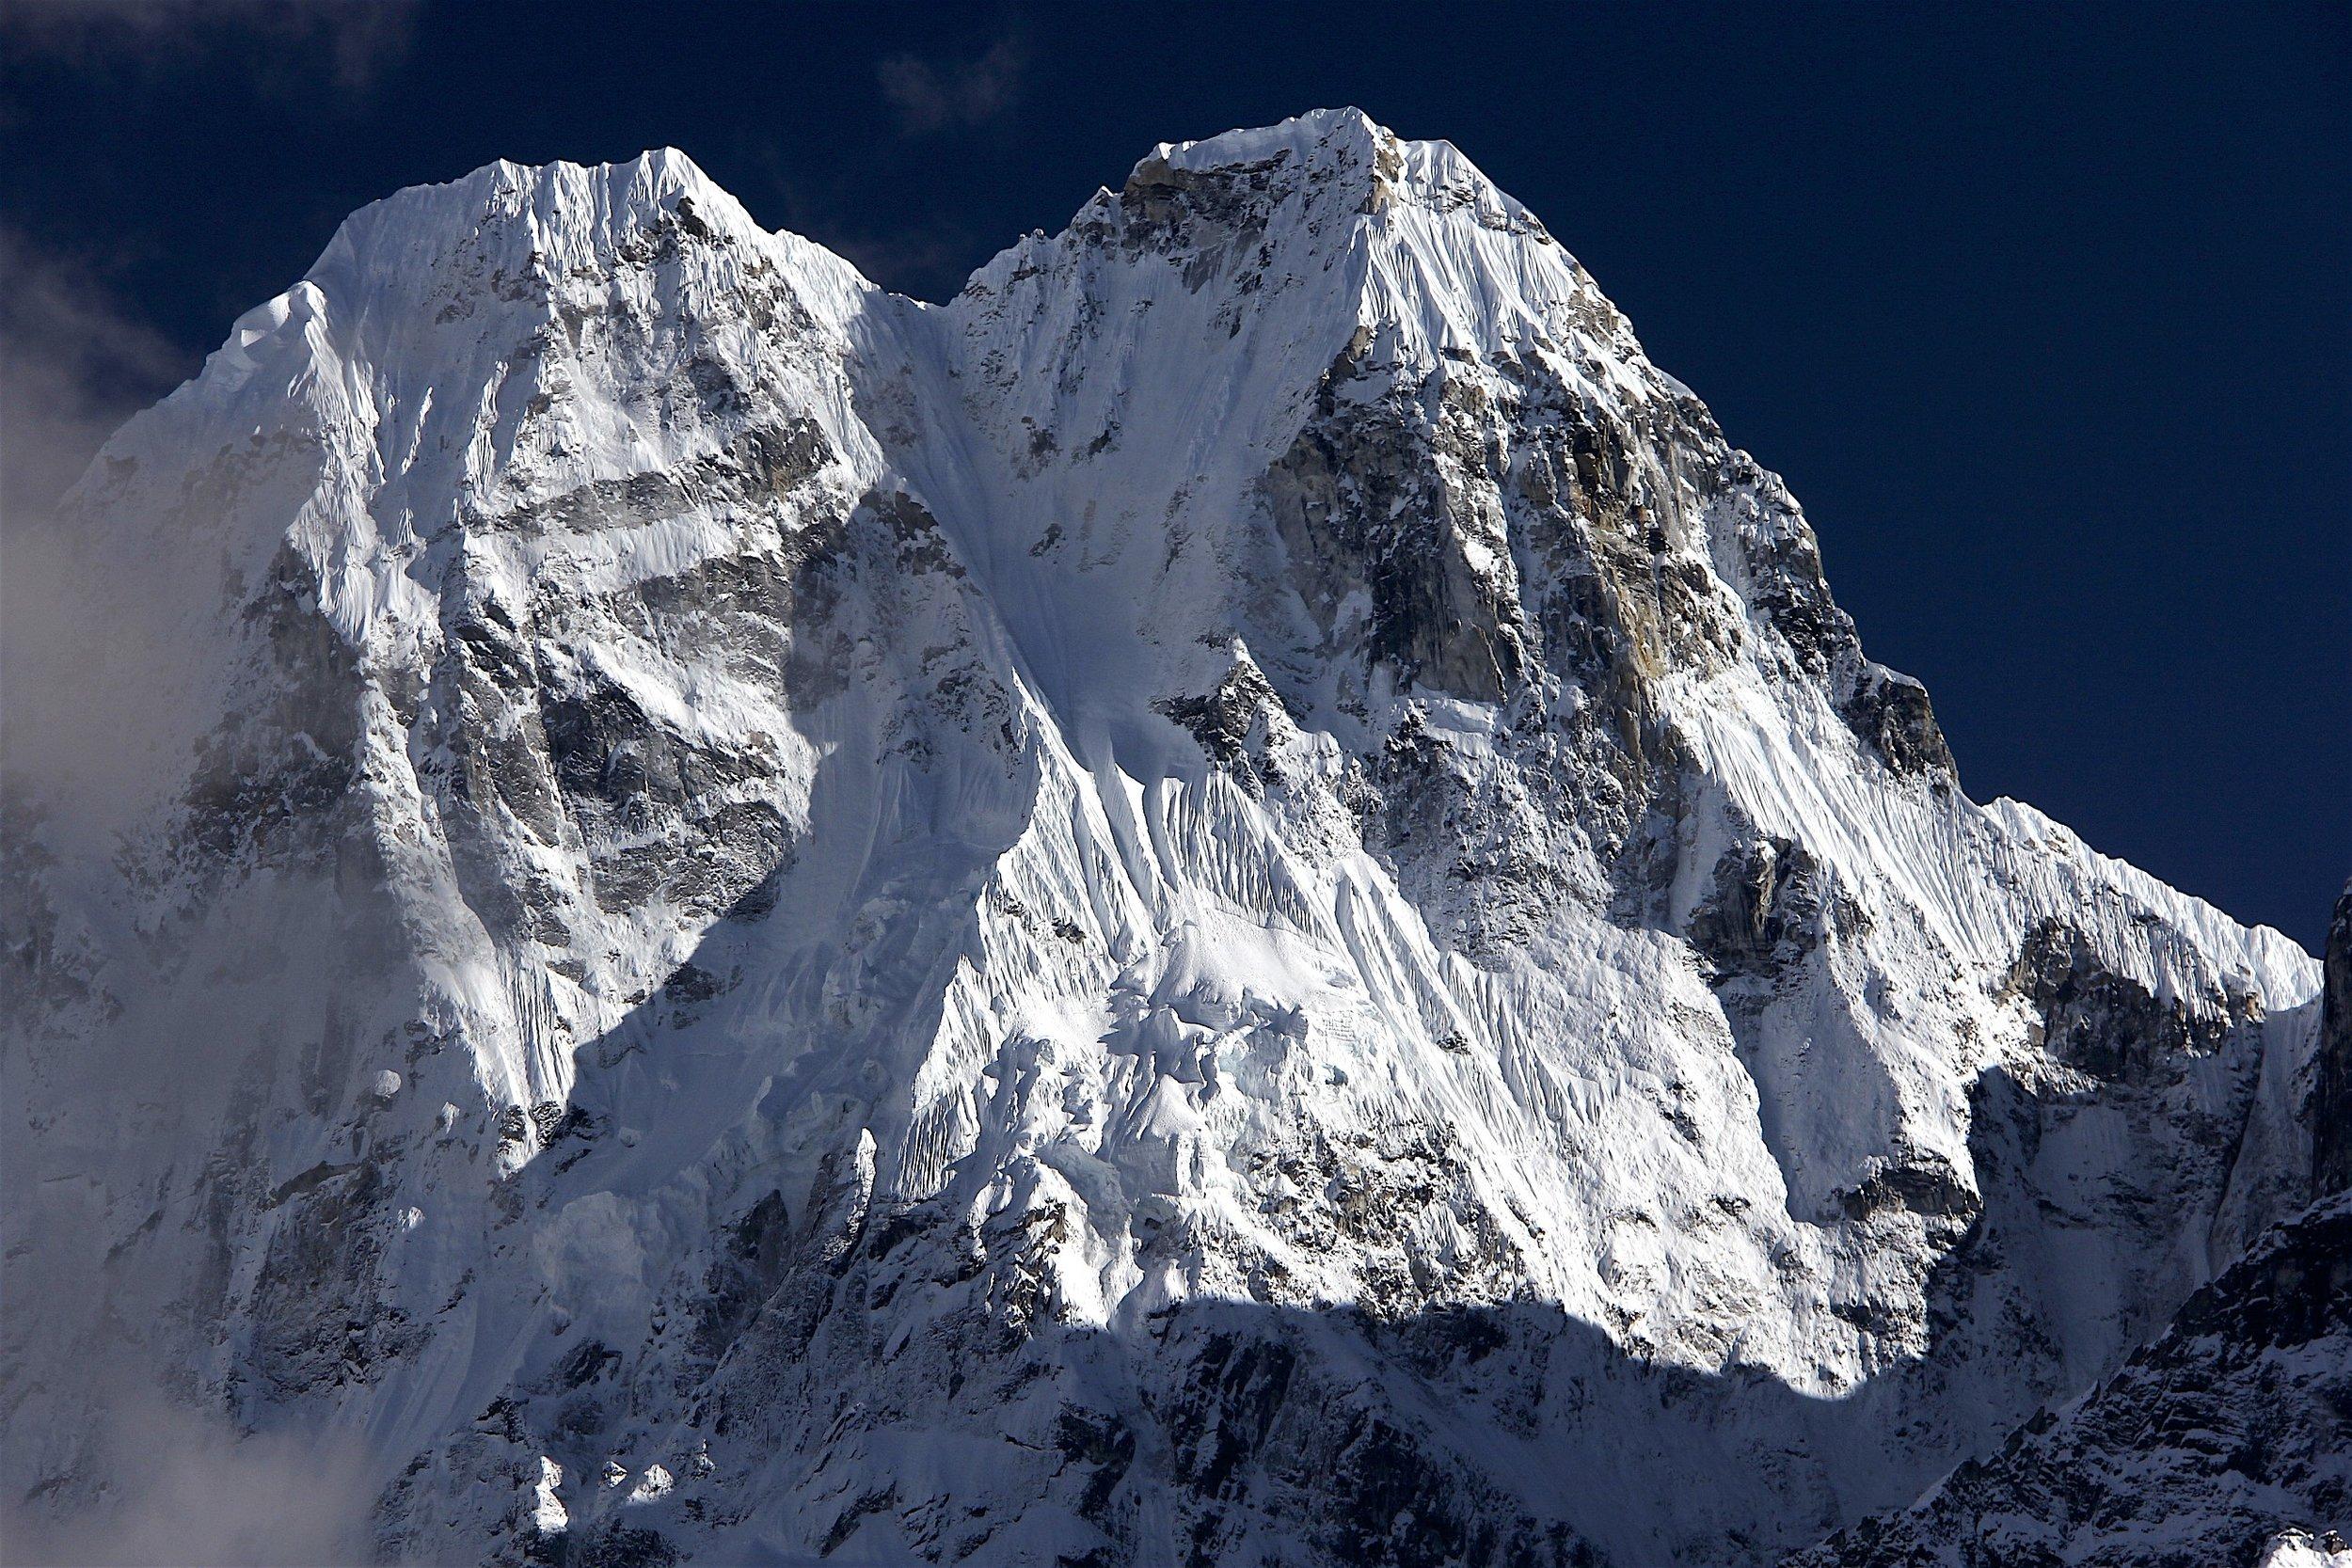 Sobi Thongje 6,670m and Pholesobi Thonje 6,645m in the Janu massif